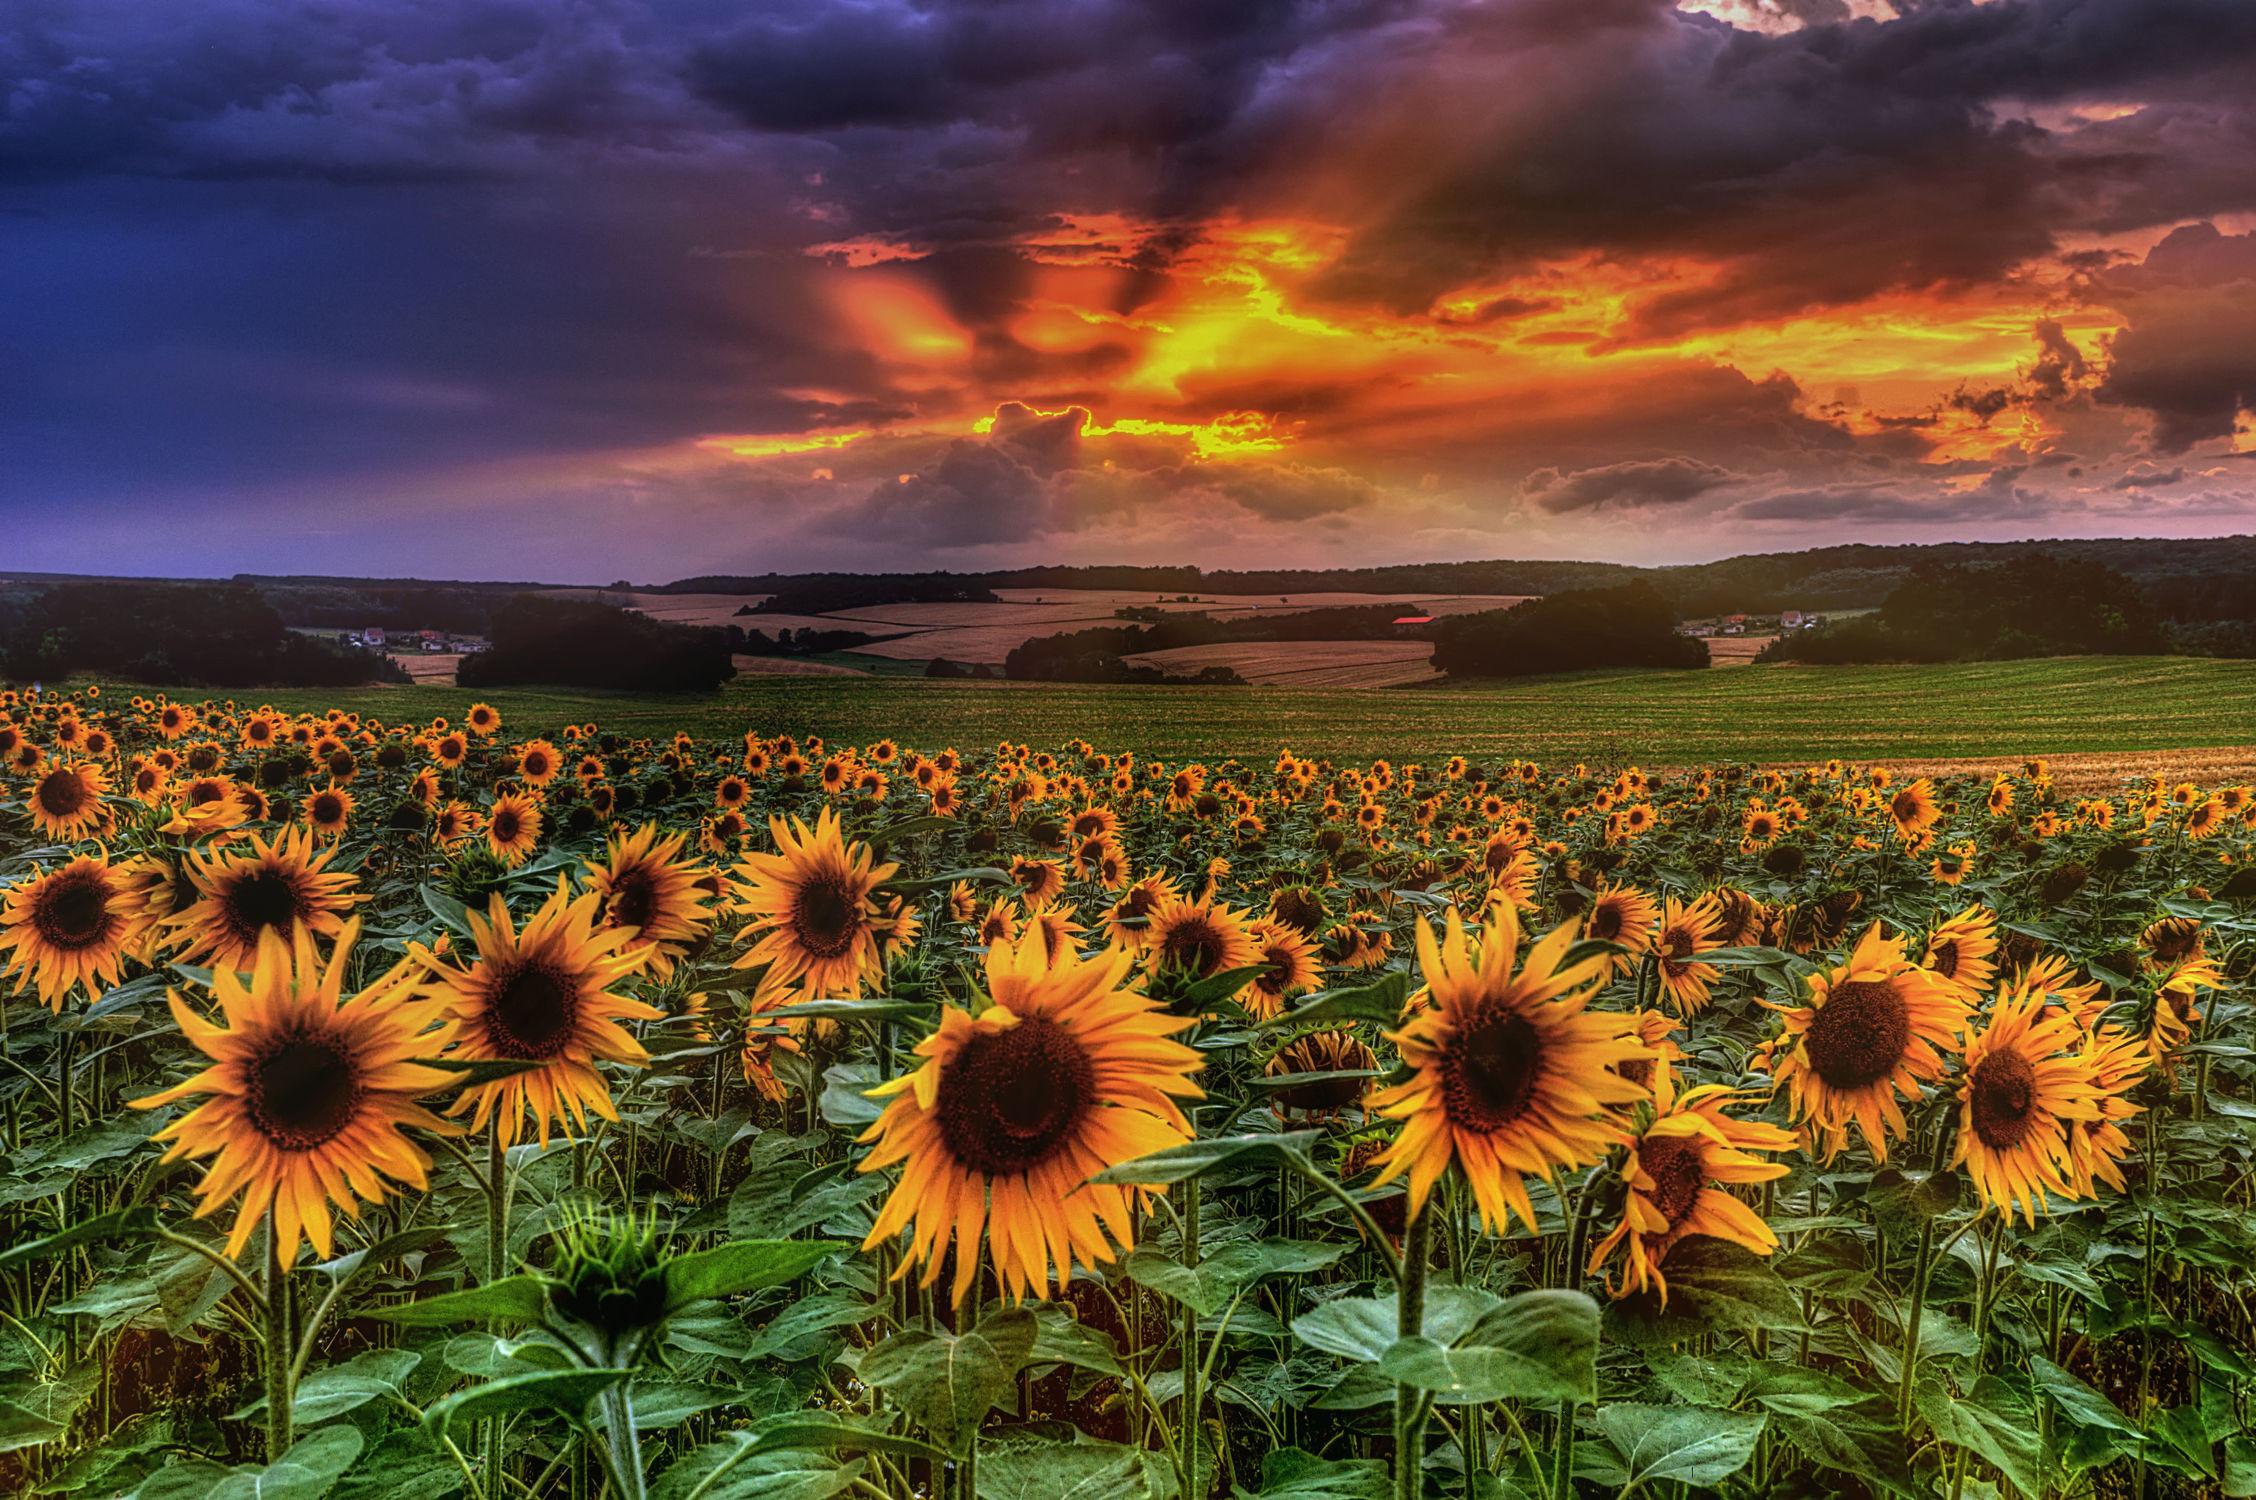 Bild mit Natur, Blumen, Sonnenuntergang, Sonnenaufgang, Sonnenblumen, Blume, Pflanze, Wiese, Sonnenblume, Feld, Felder, Wiesen, Weide, Weiden